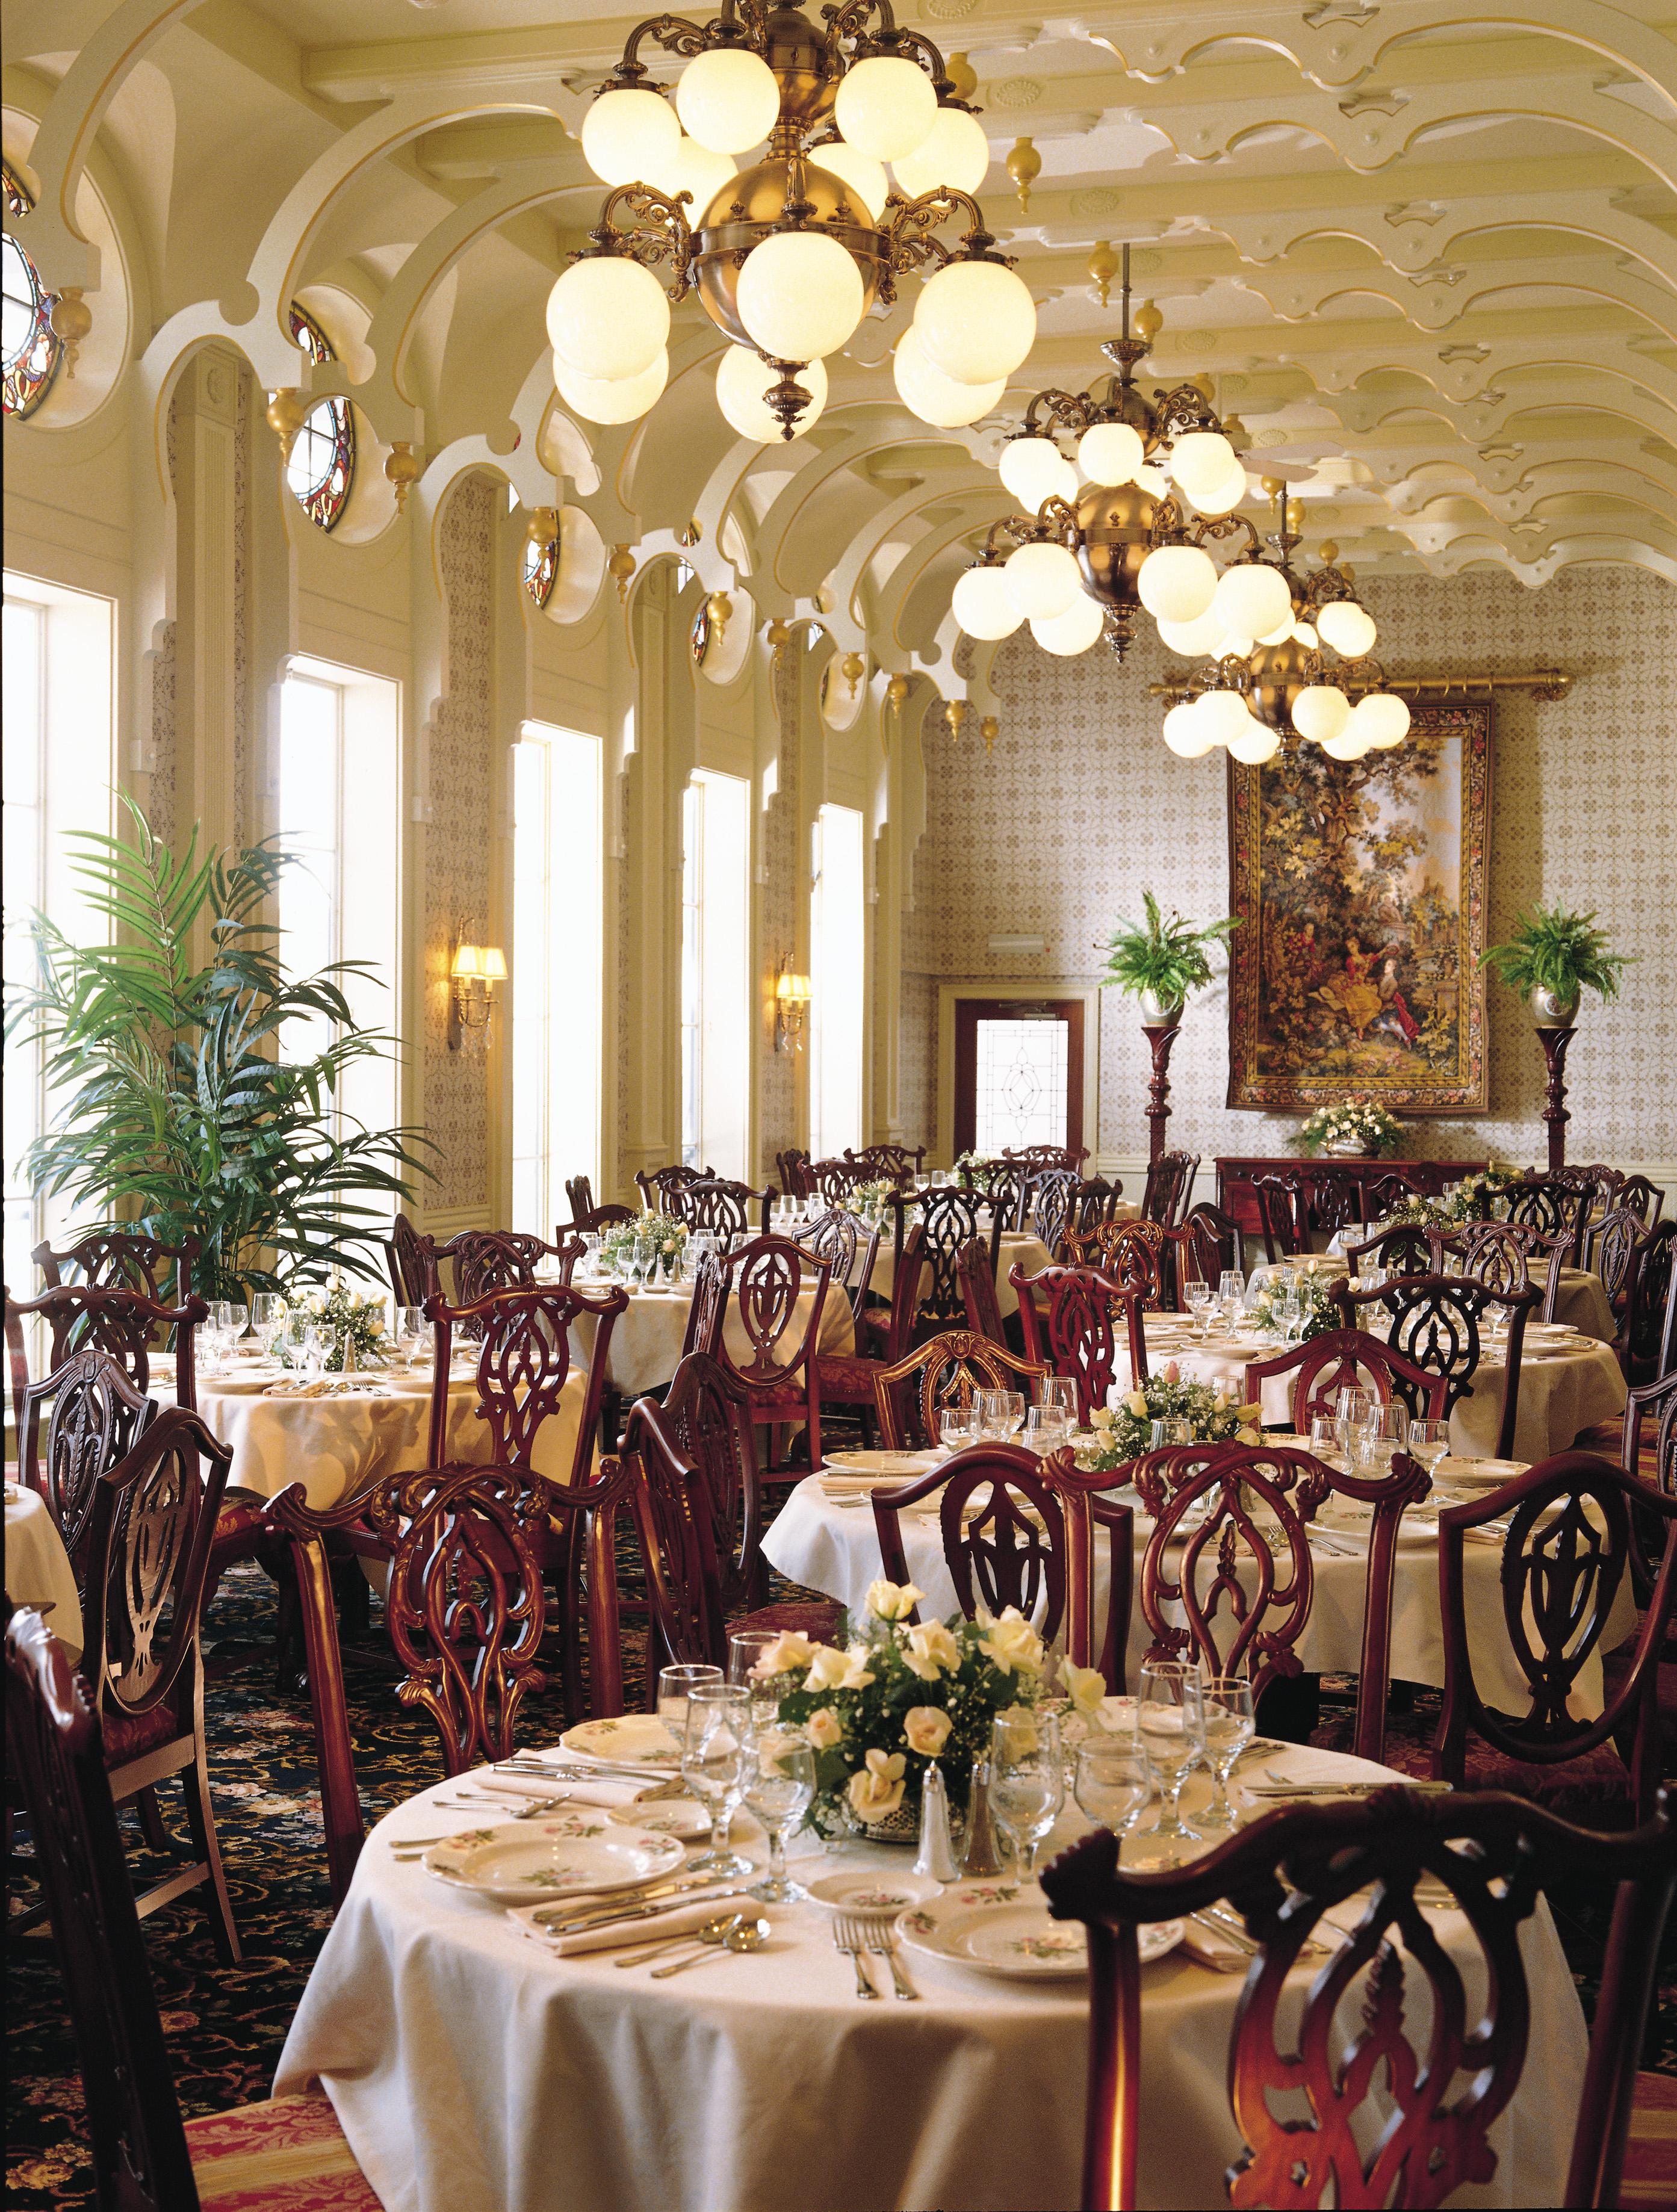 American Queen Steamboat Company American Queen Interior Dining Room 7.jpg